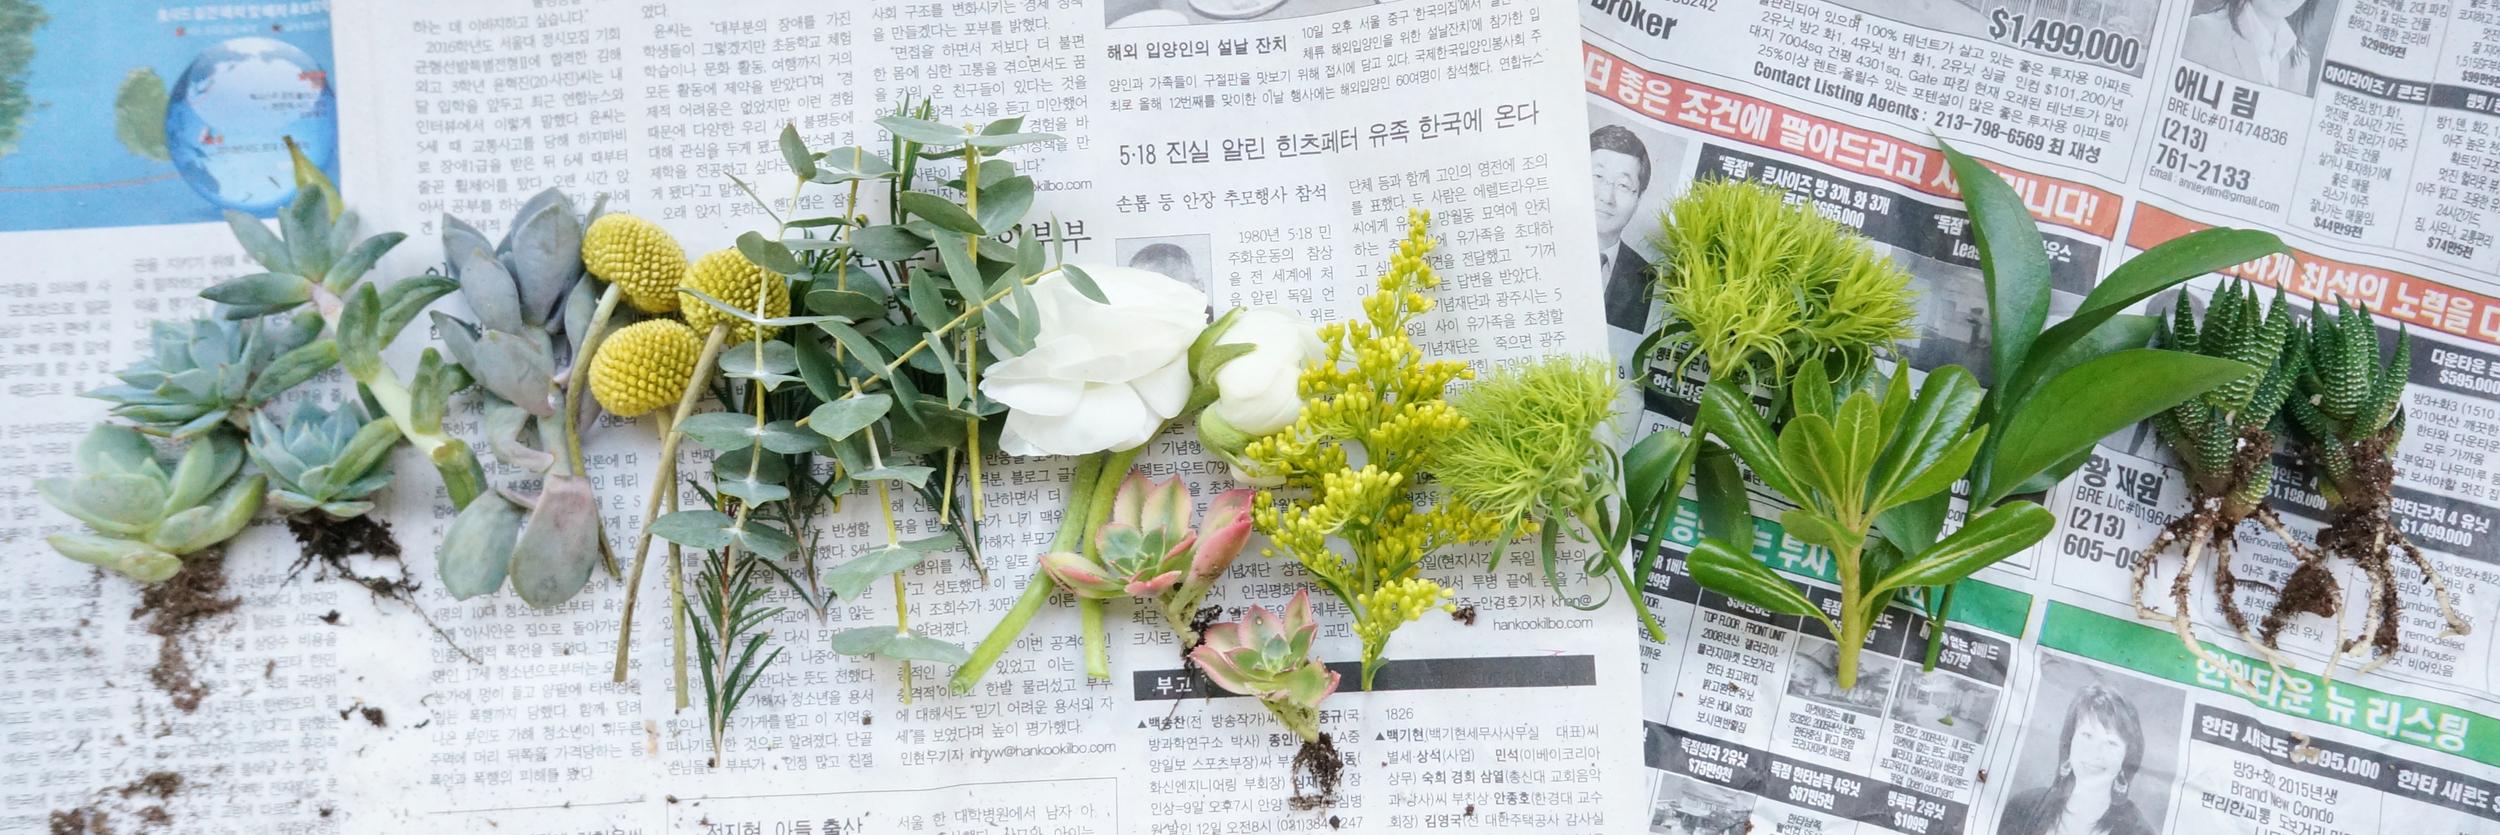 boutonniere-plants.jpg